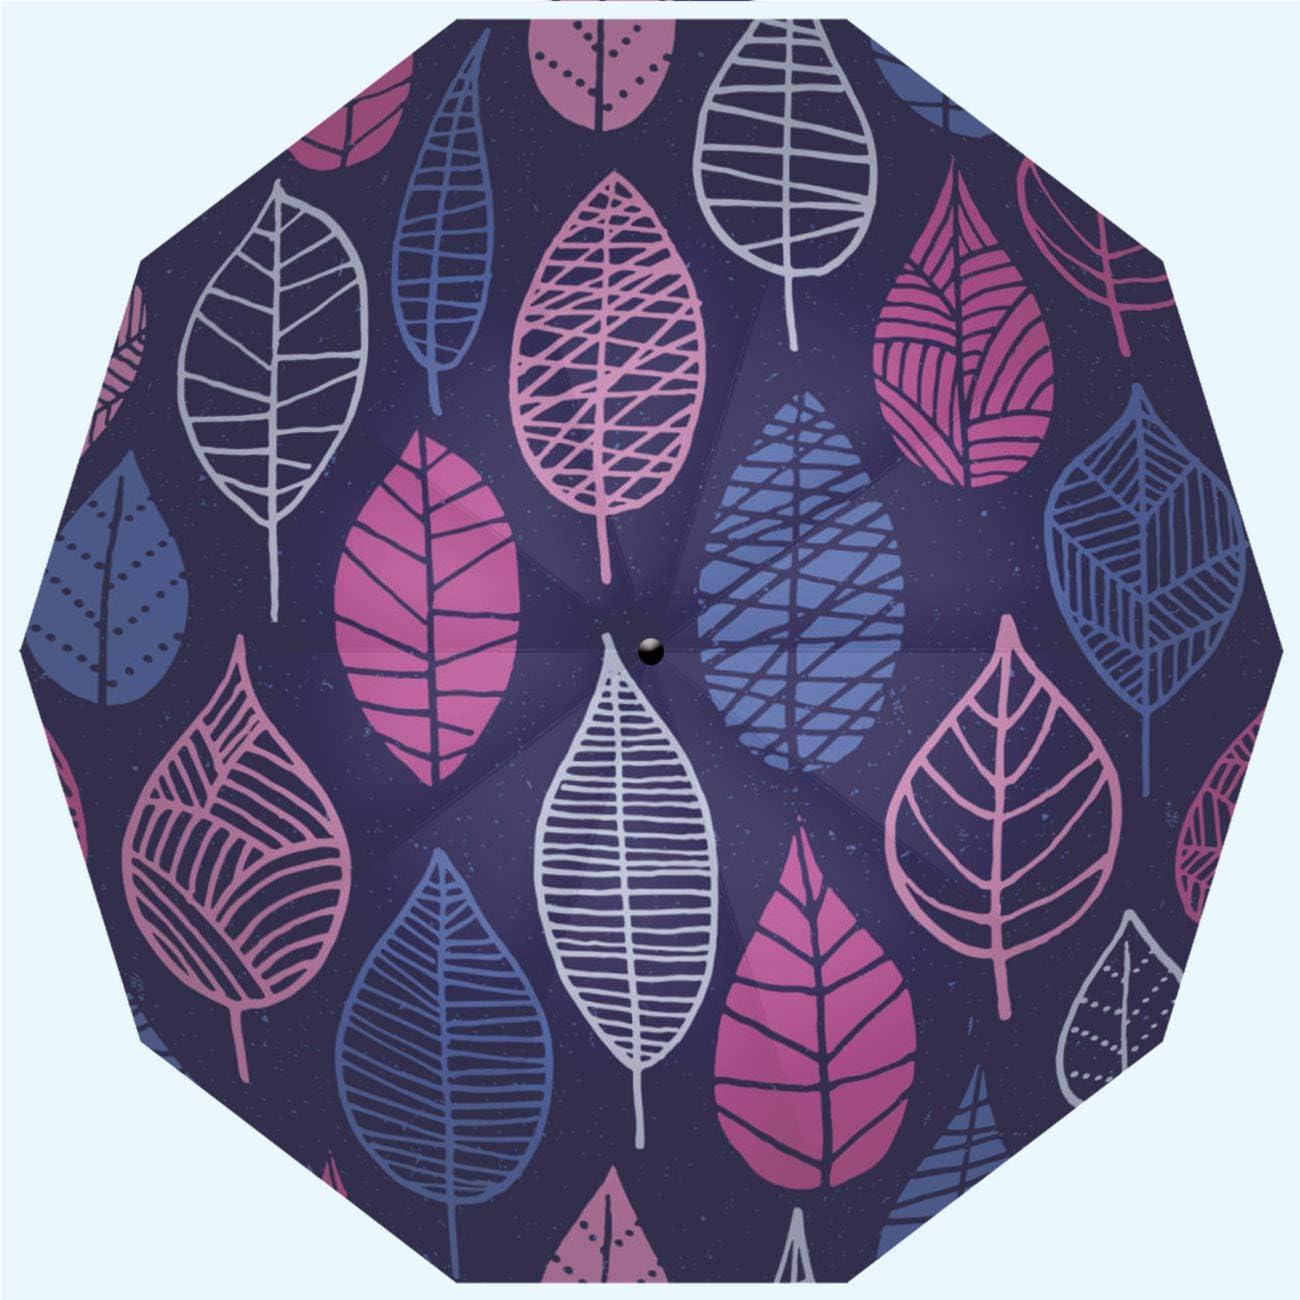 RLDSESS Spring Compact Patio Umbrella Clo Opening Washington Mall Automatic and Max 40% OFF